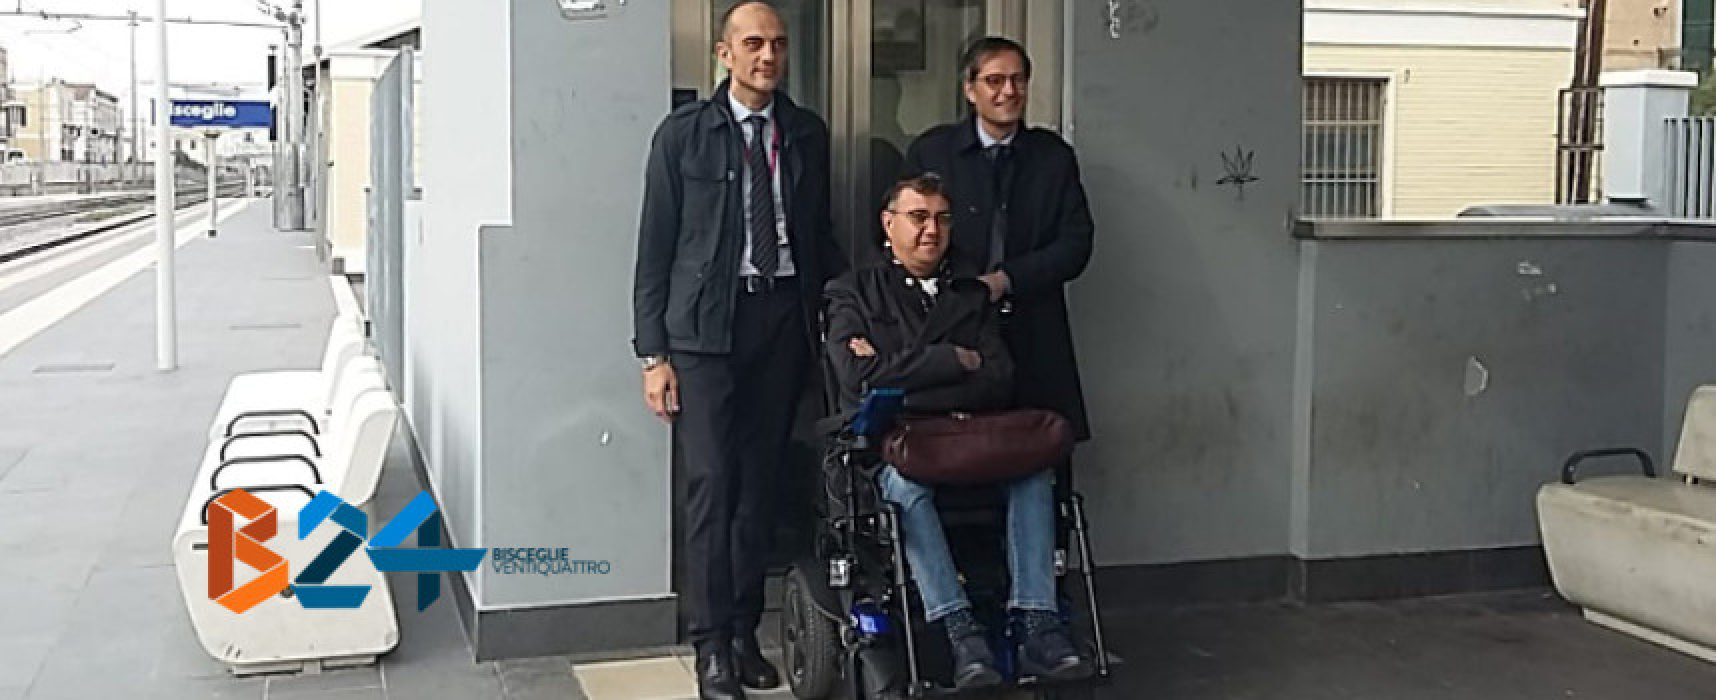 Una città a misura di tutti, inaugurati gli ascensori alla stazione ferroviaria di Bisceglie